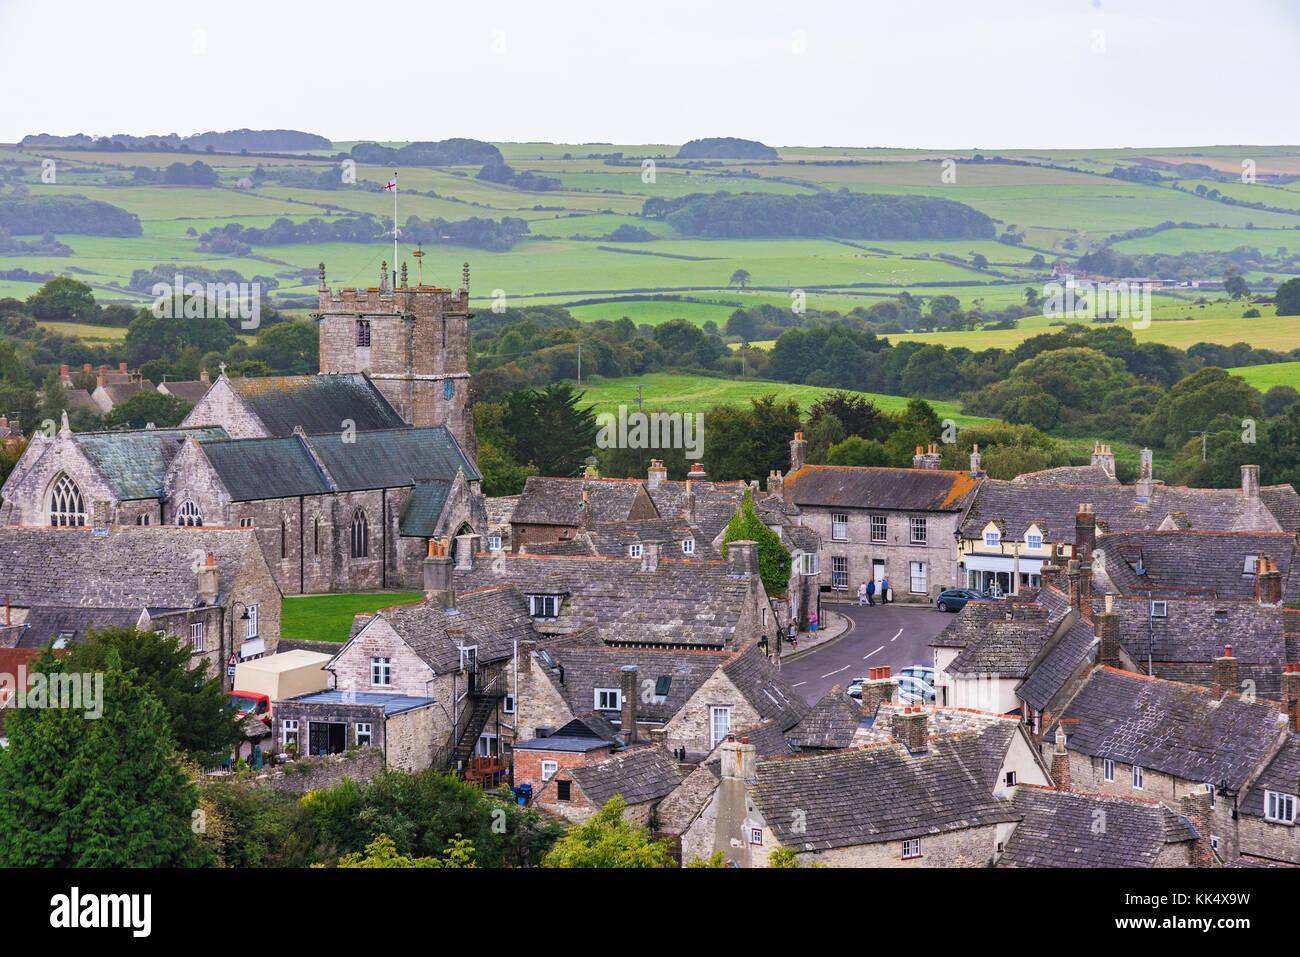 Corfe medieval village traditional British architecture Stock Photo